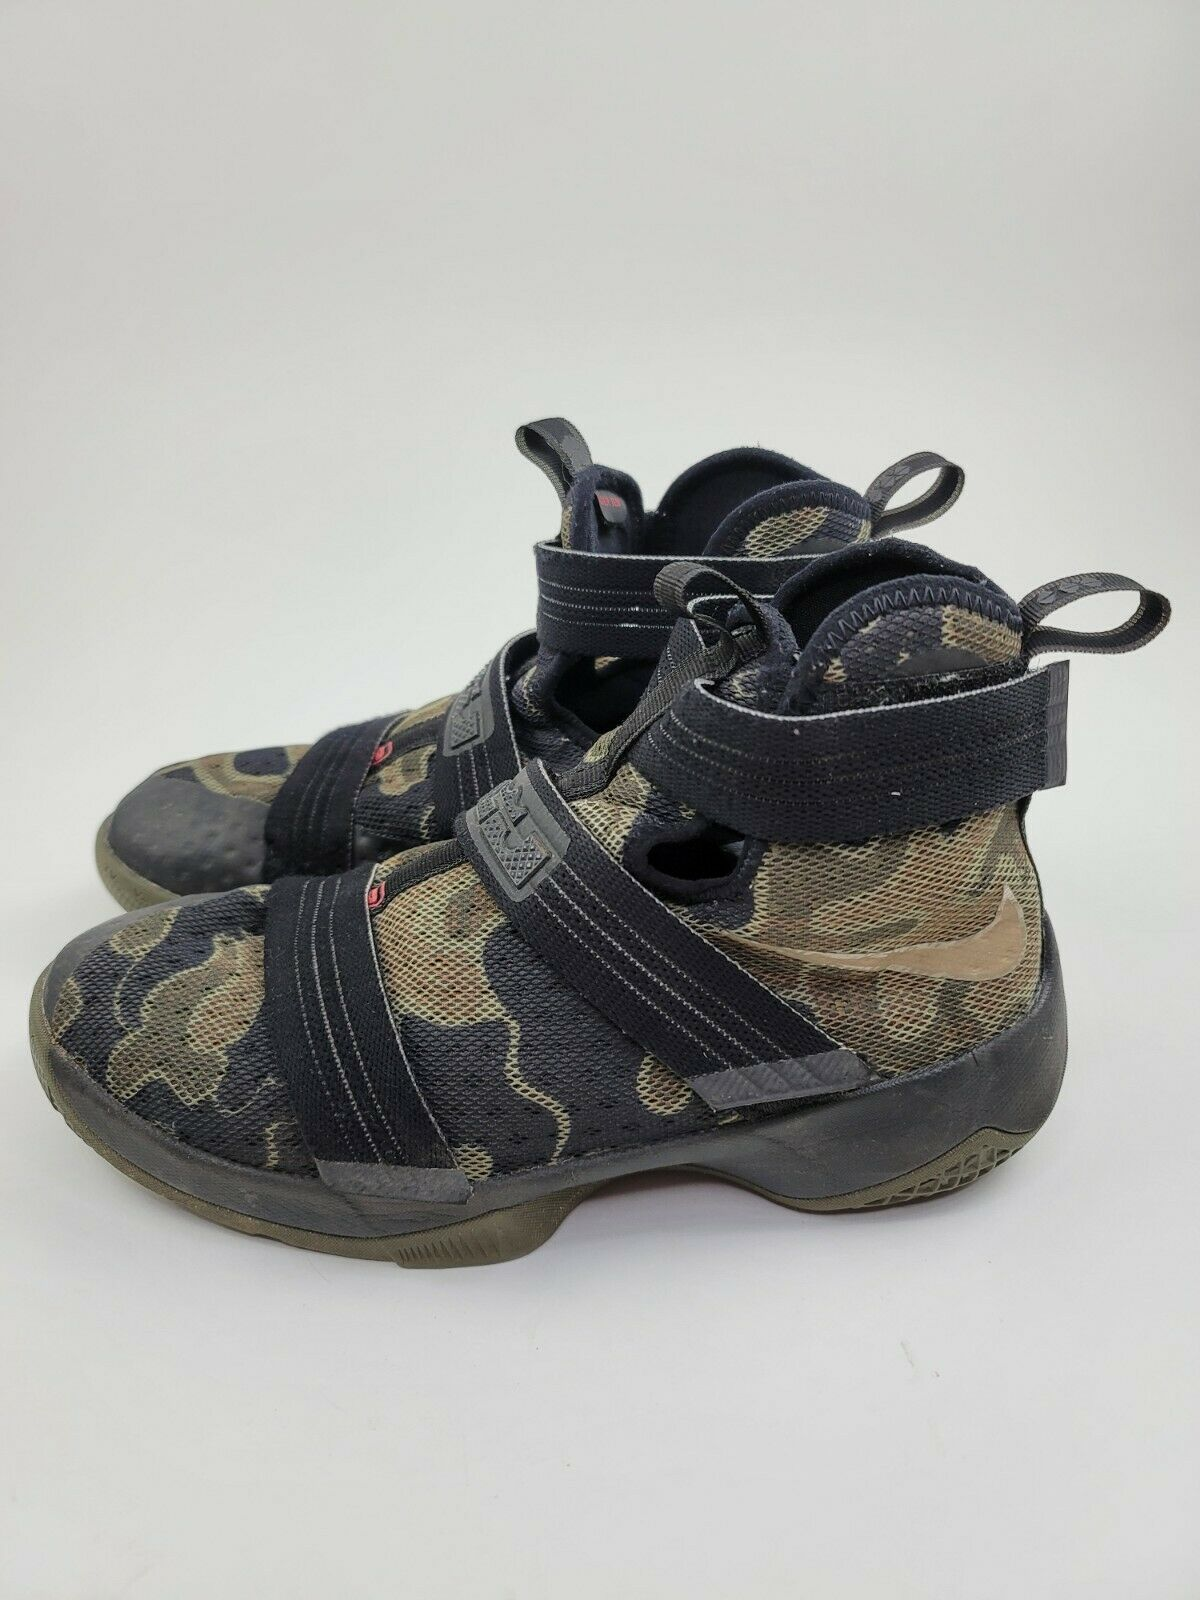 Nike Youth Size 6.5 Camo Lebron James